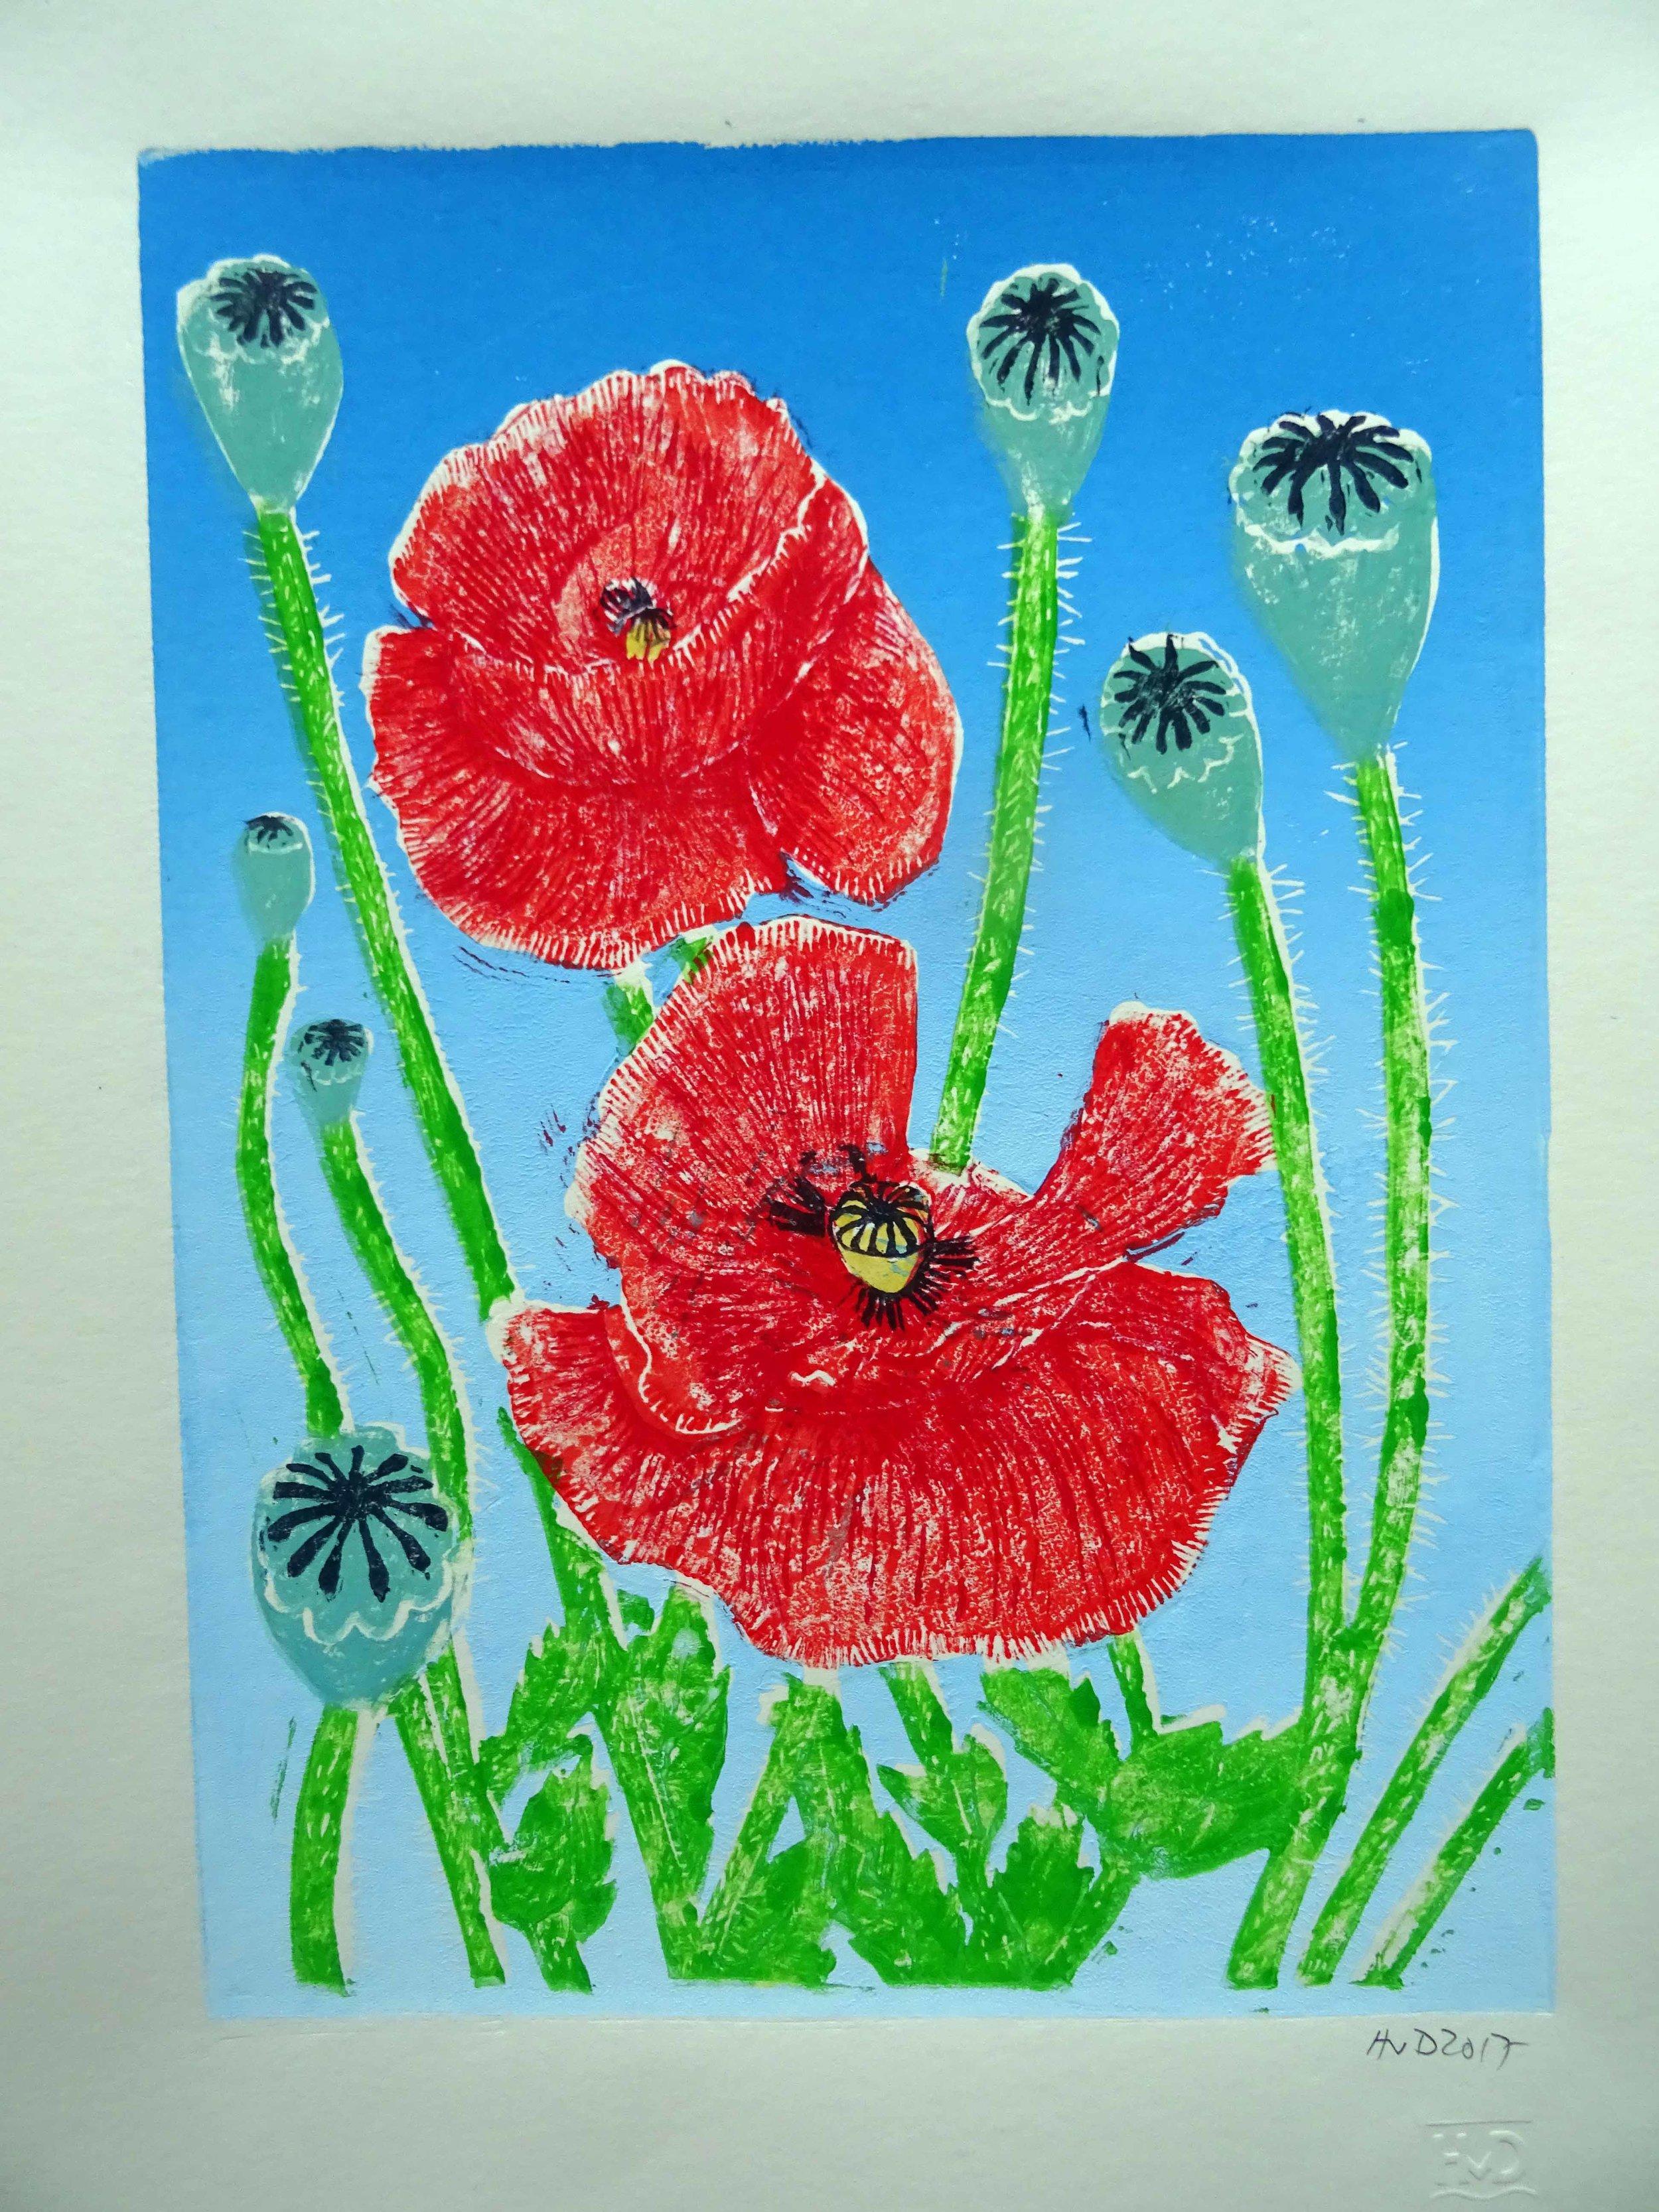 243 - Mohnblumen, 3-plate lino 30x21 cm, 70 €